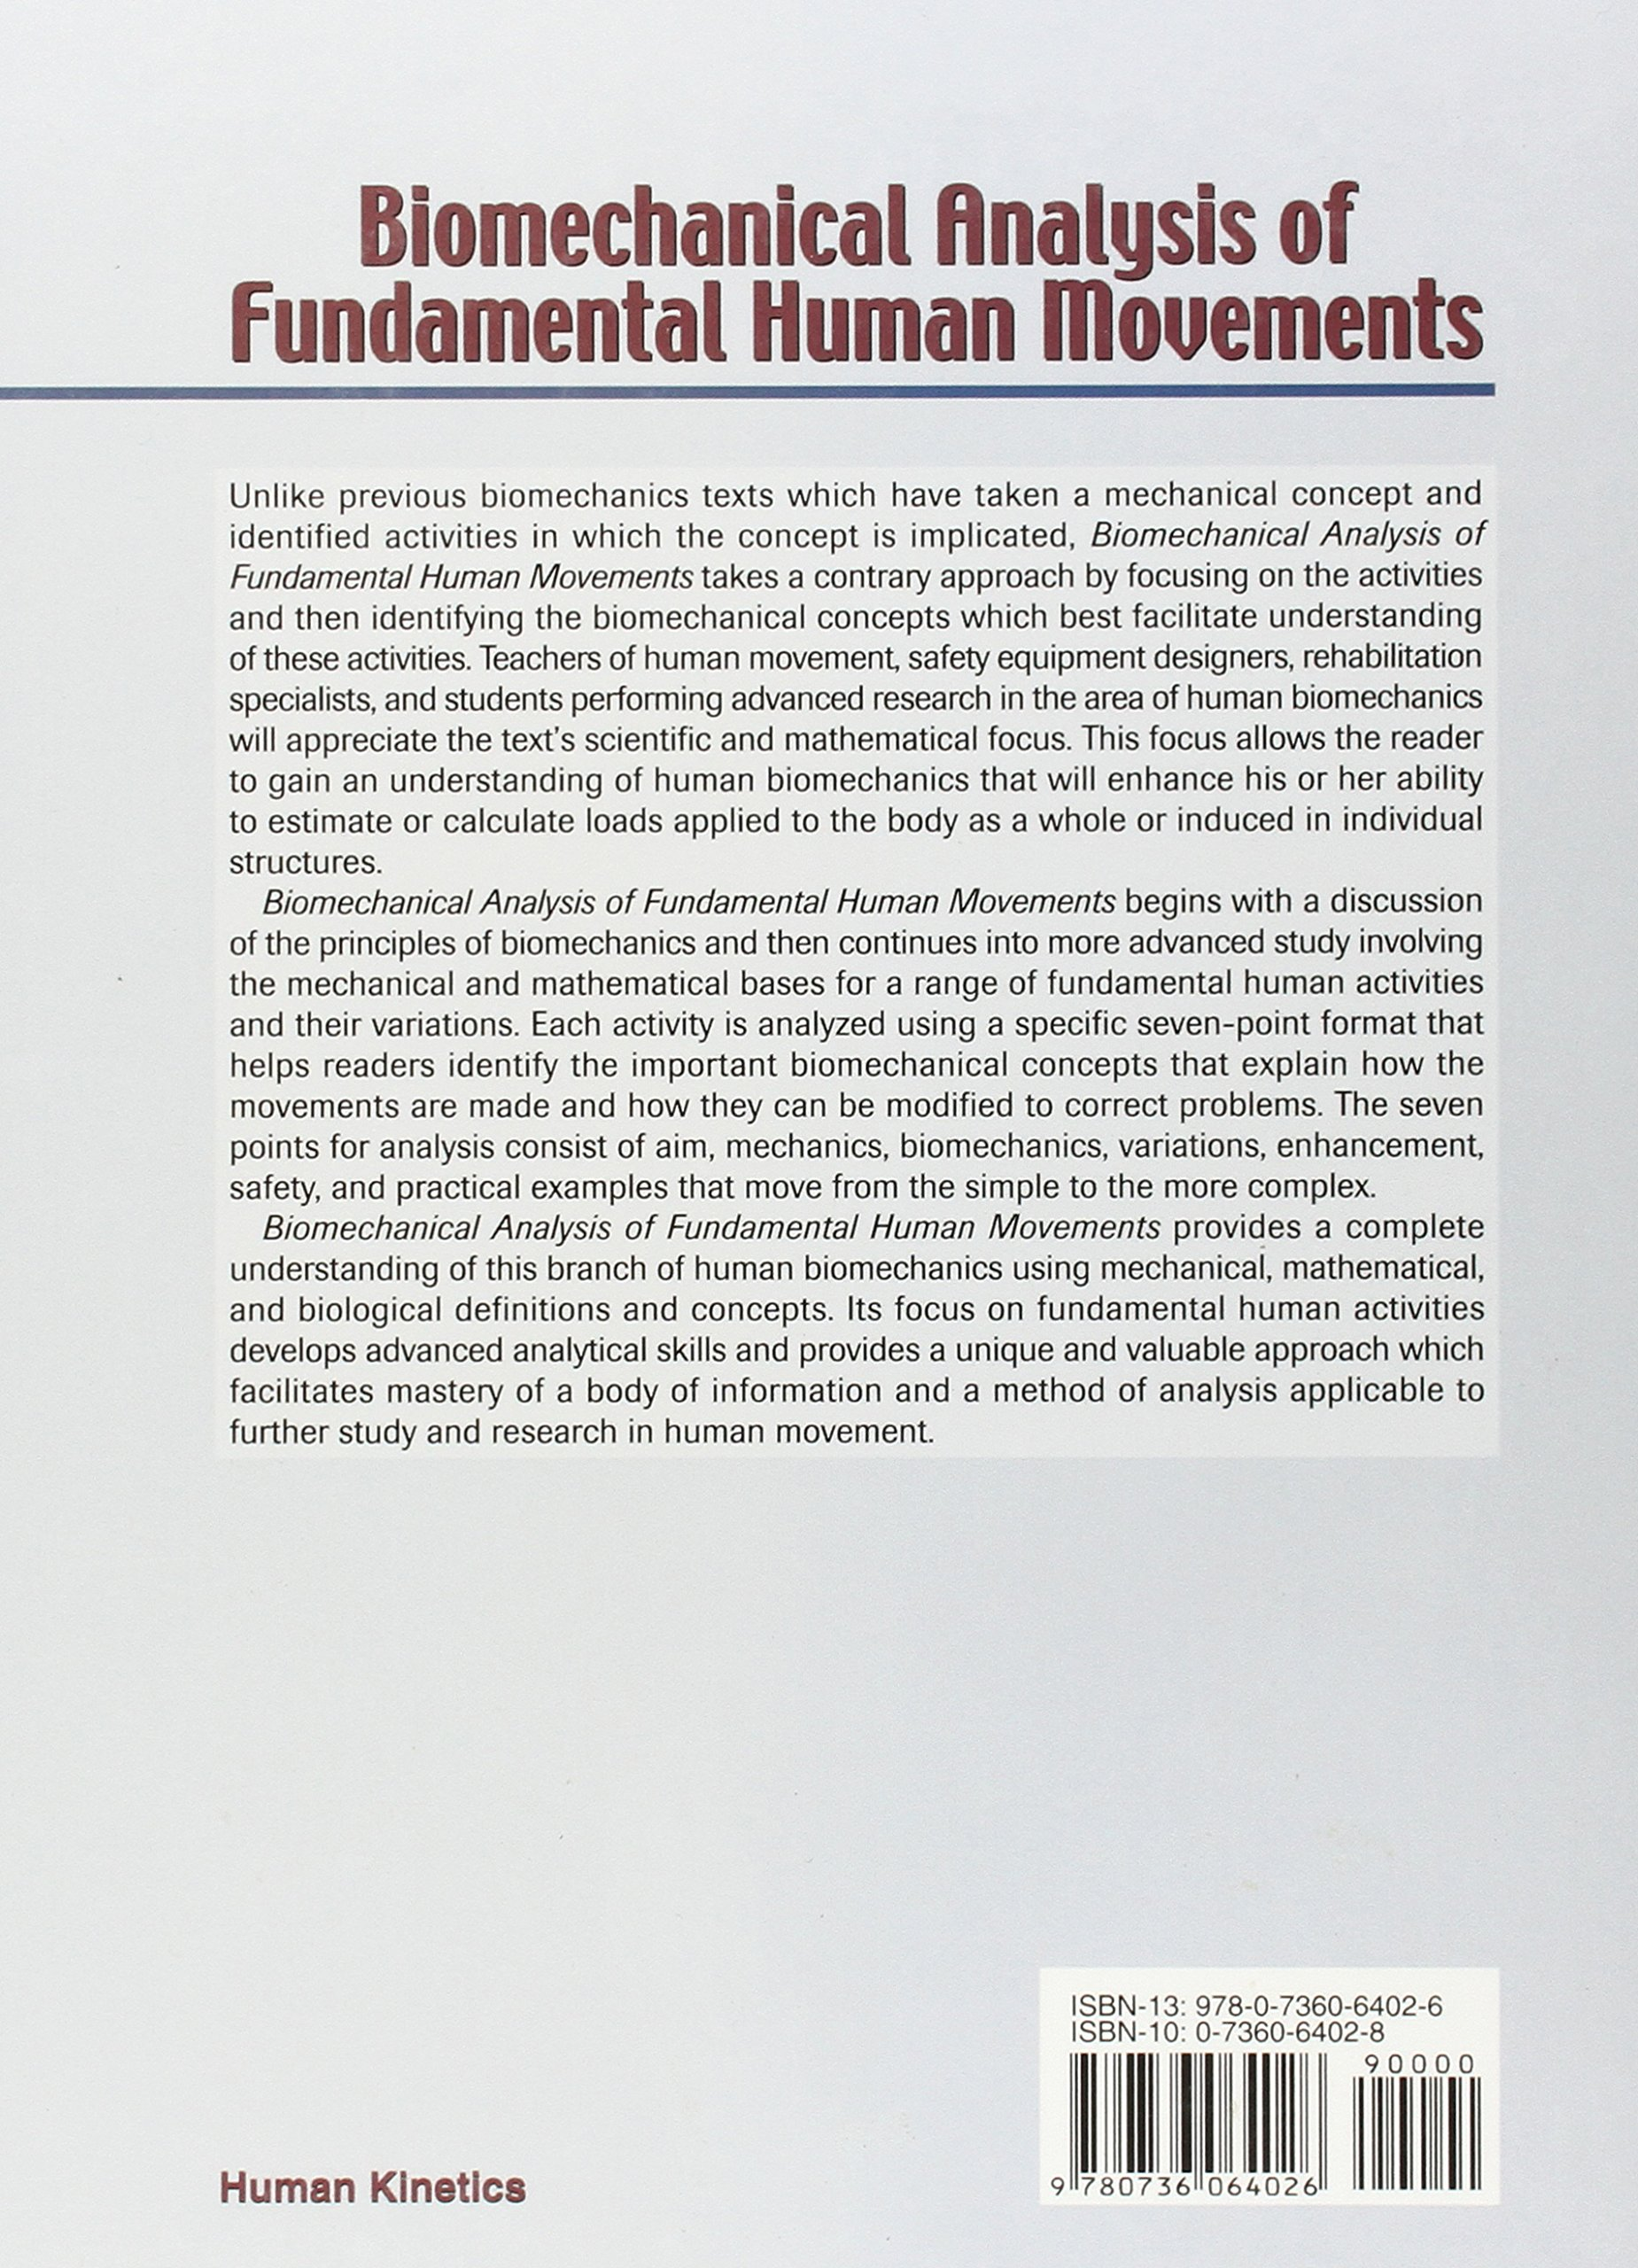 HLTH SC 2101 - Fundamentals of Biomechanics and Human Movement